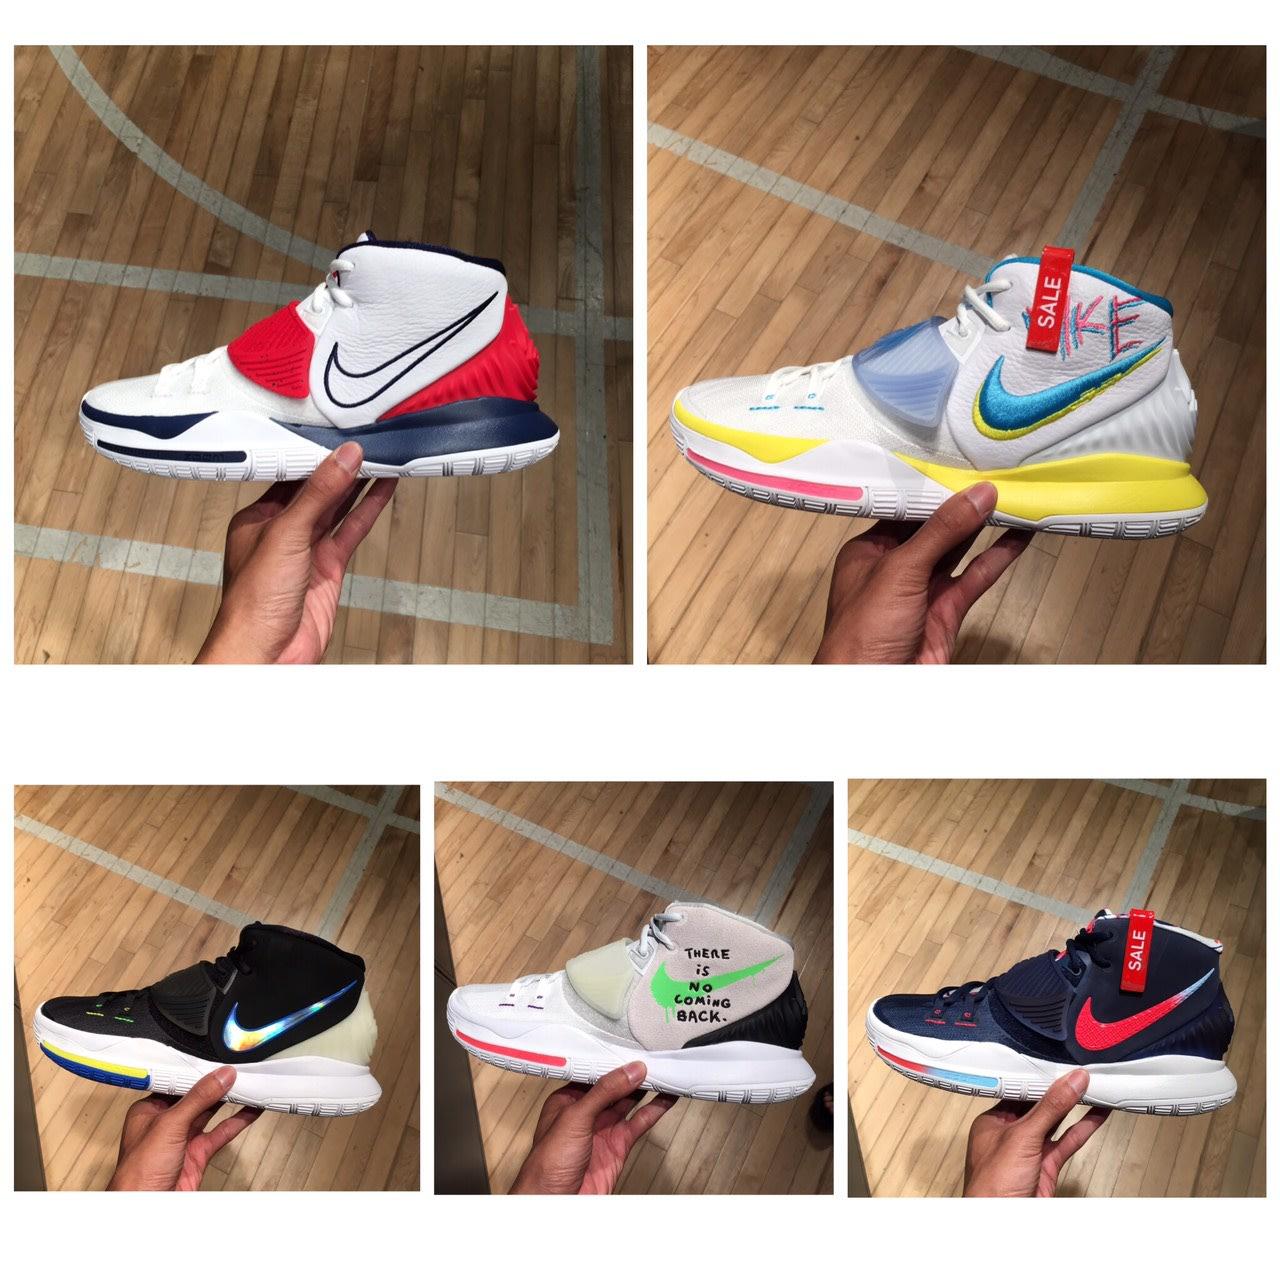 【G CORNER】Nike Kyrie Irving 6 高筒籃球鞋 KI 厄文 氣墊 避震 緩震 多色 BQ4631